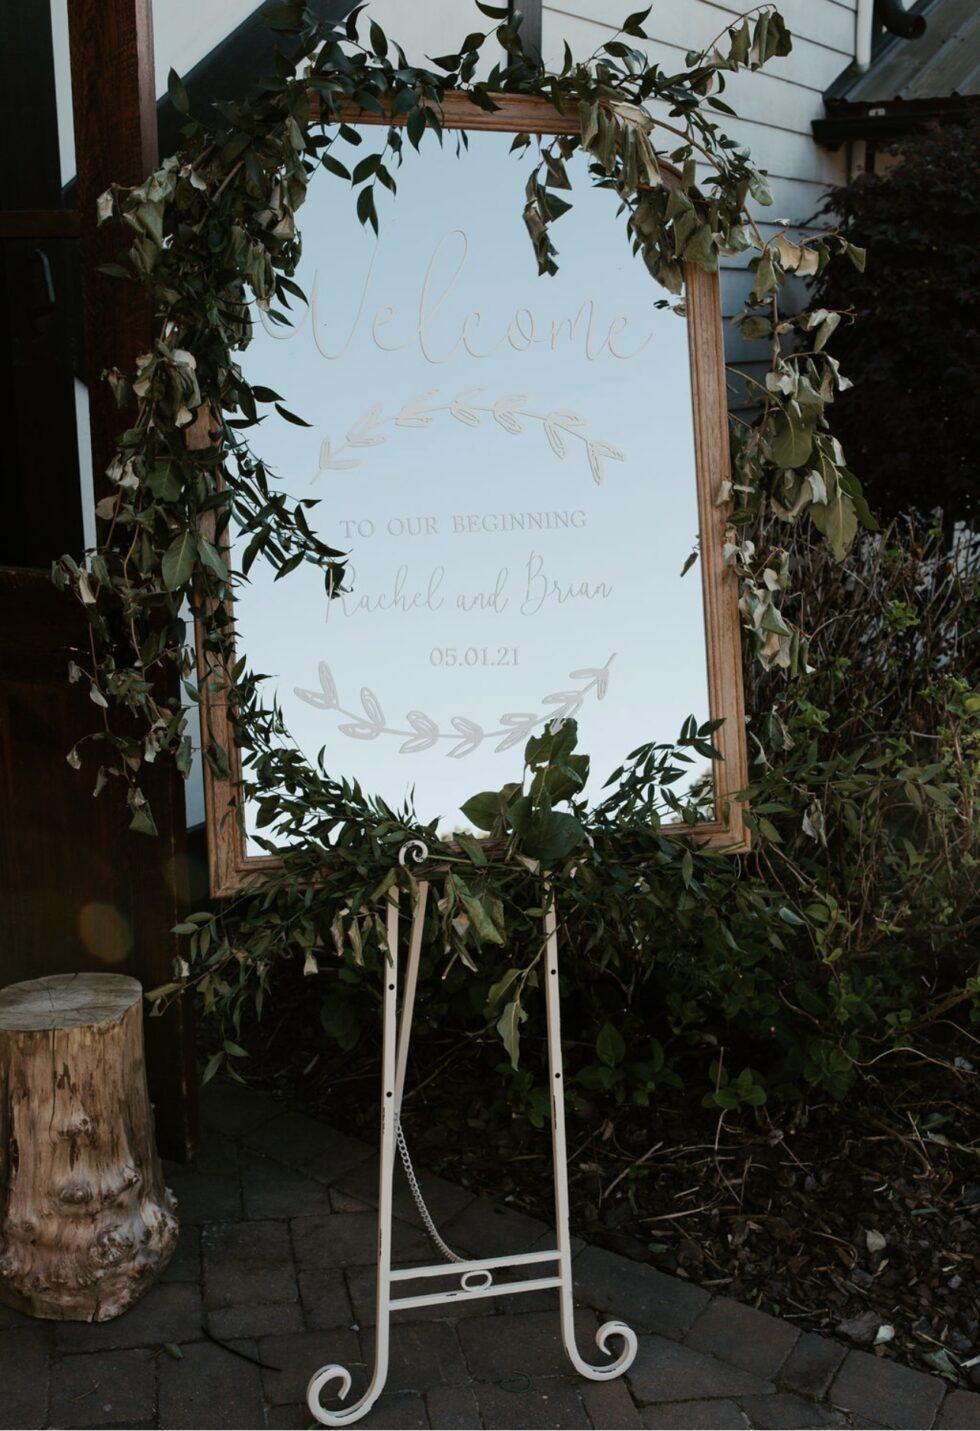 Spring-Wedding-at-Summerfield-Farms-Rachel-and-Brian-58